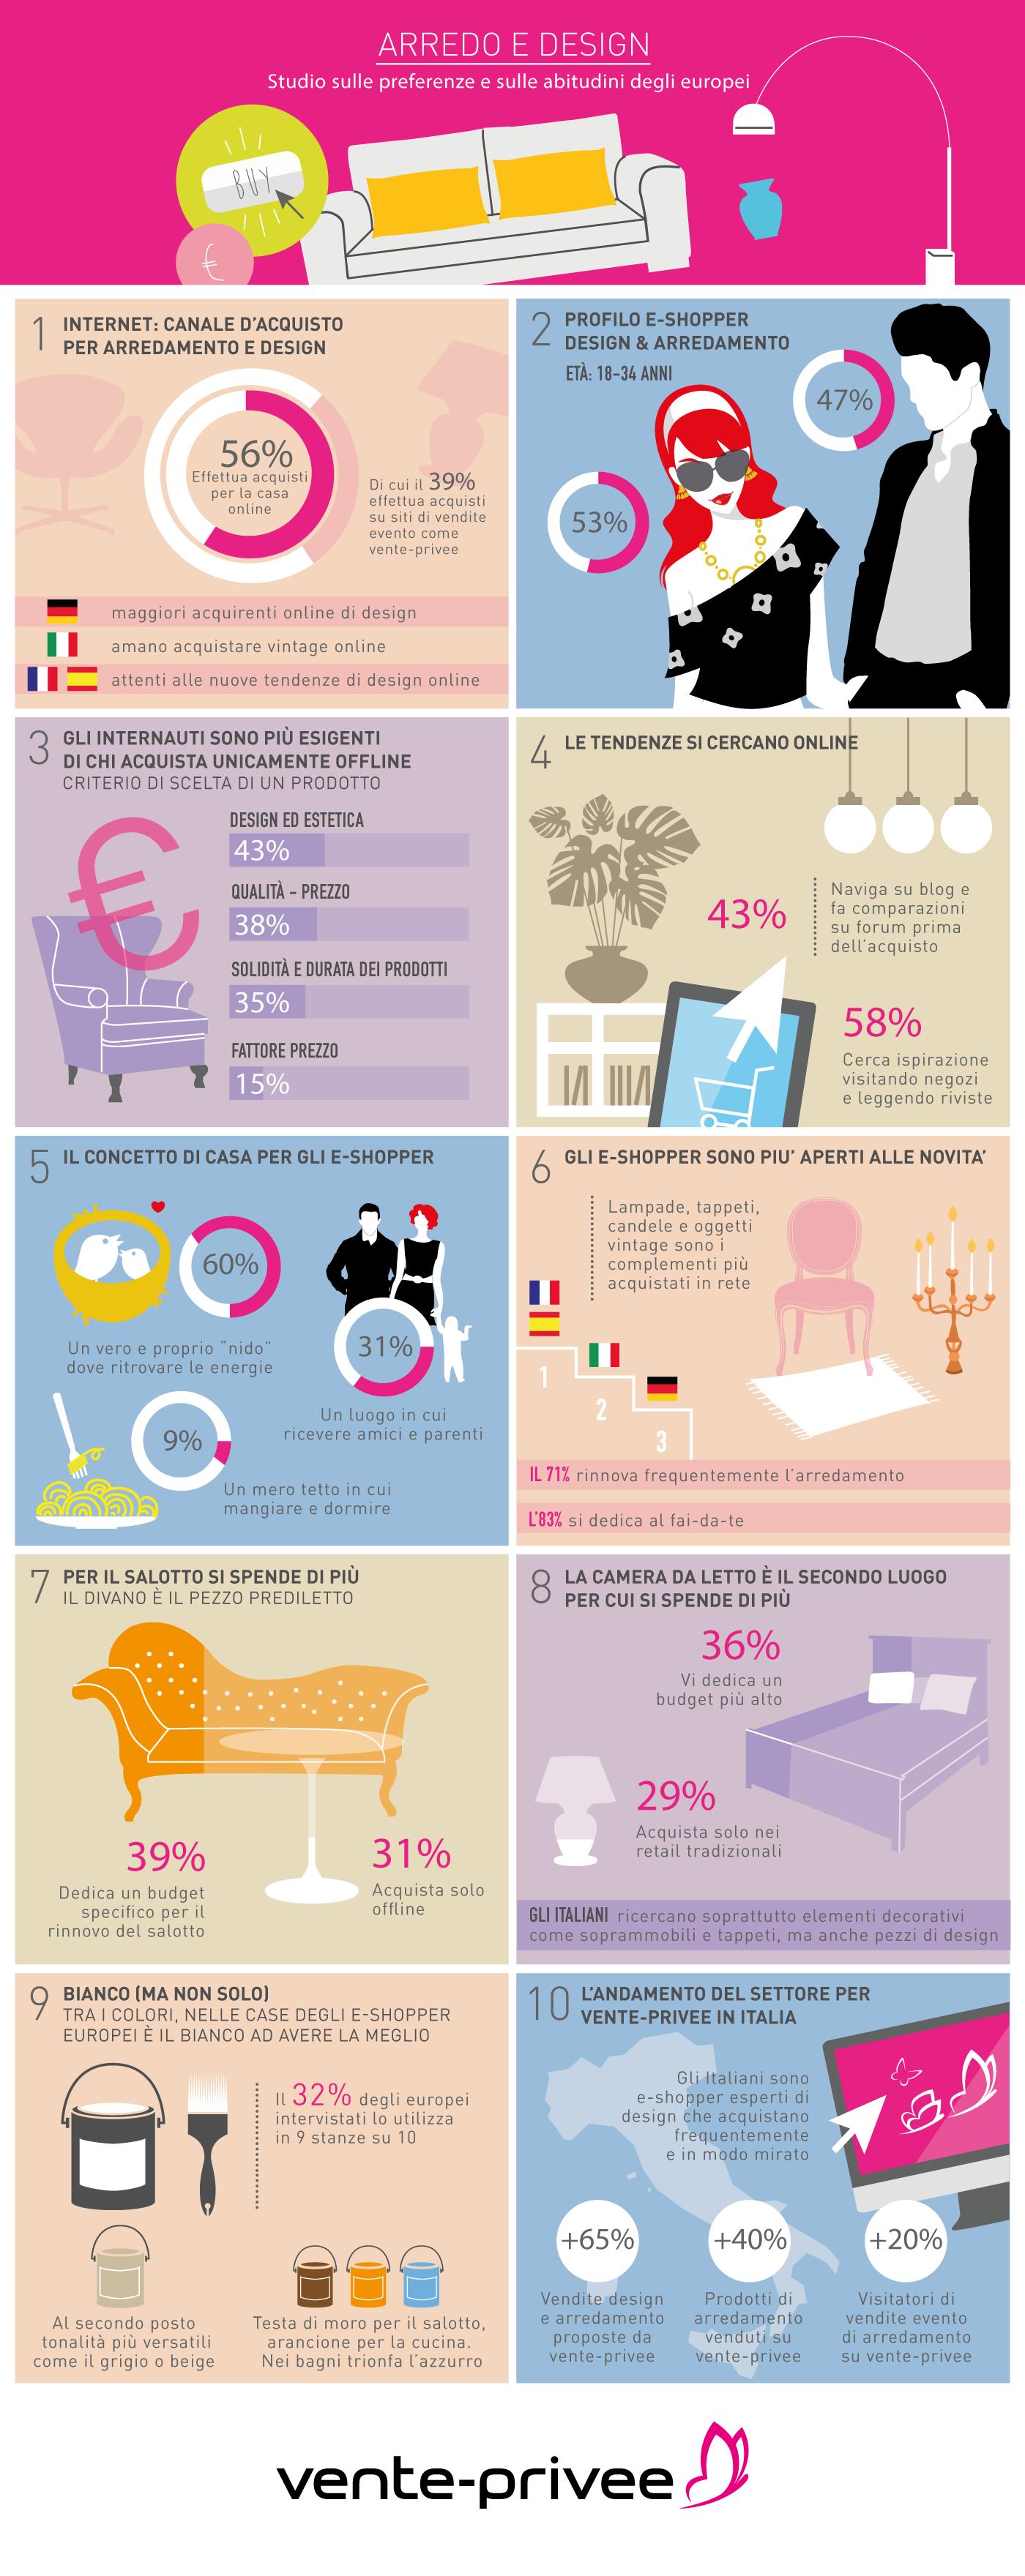 vente-privee infografica Design wall